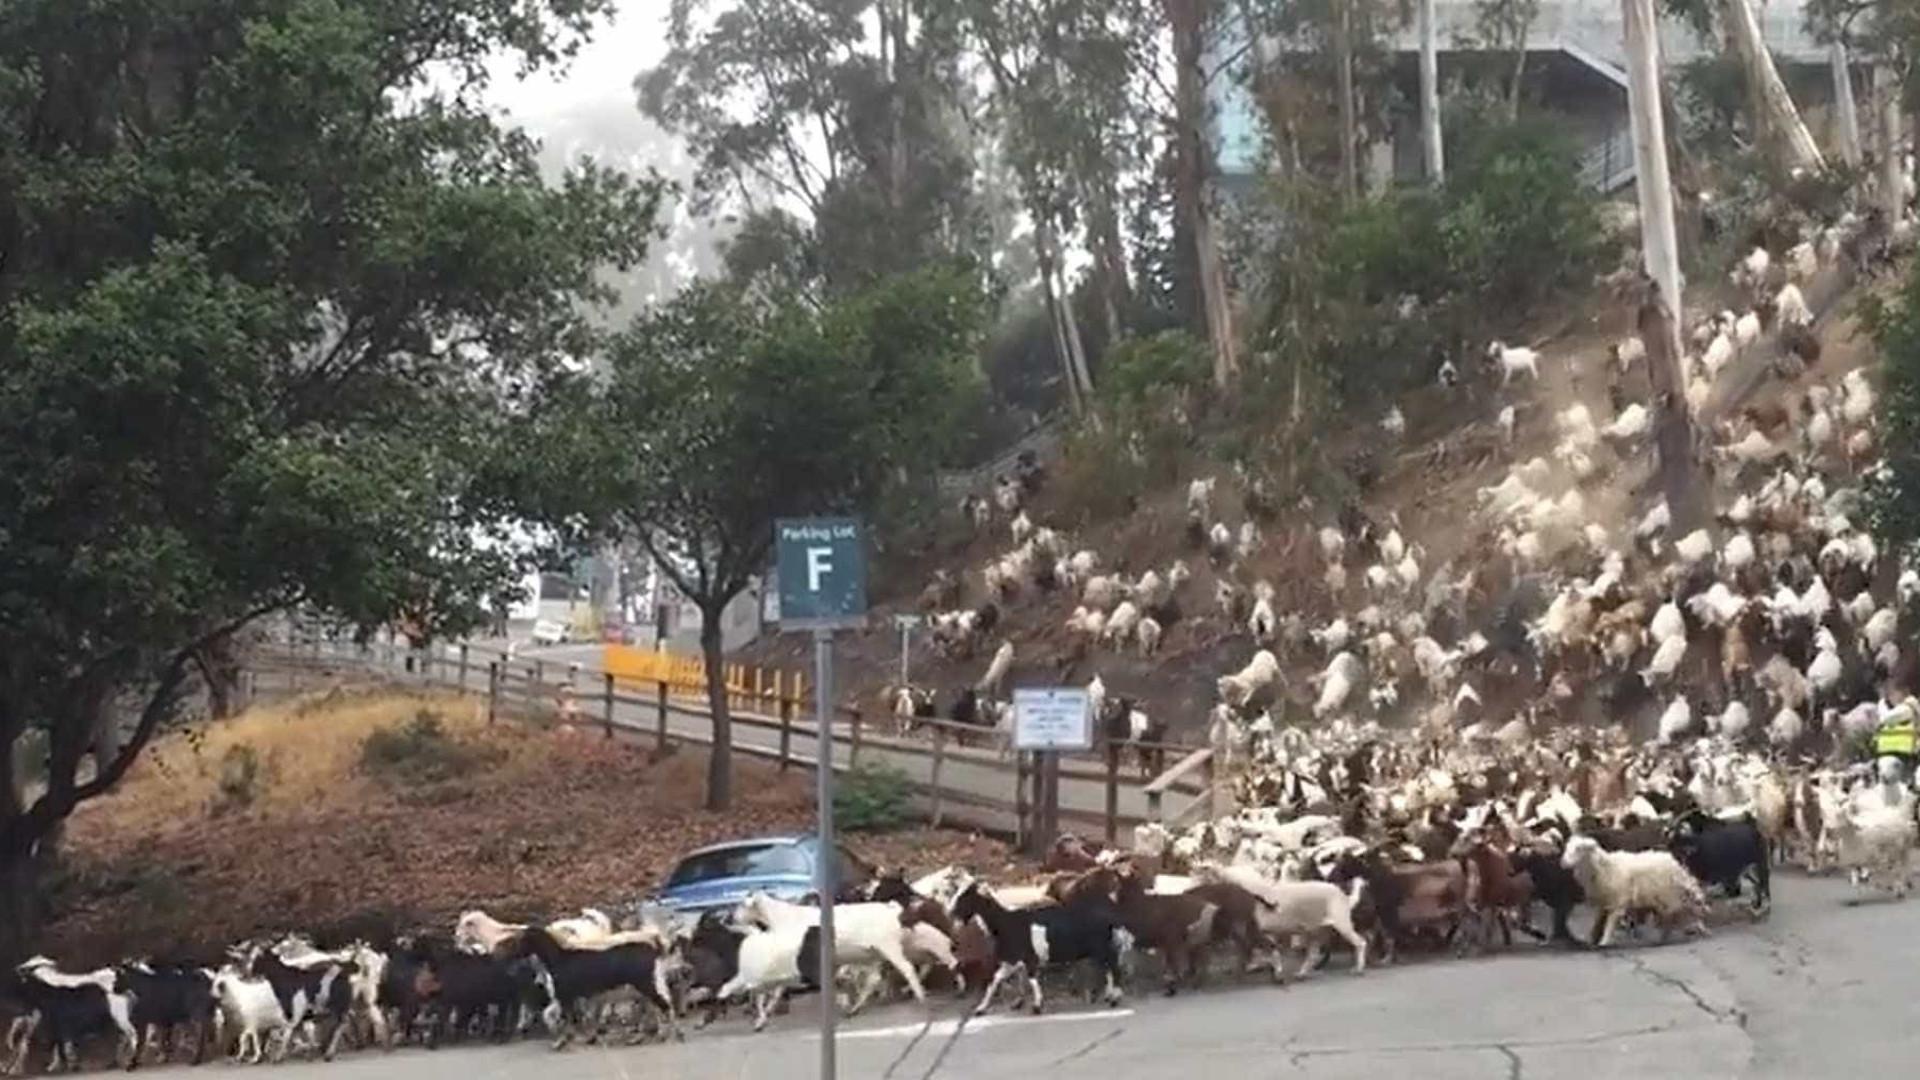 'Avalanche' de cabras fecha estrada na Califórnia